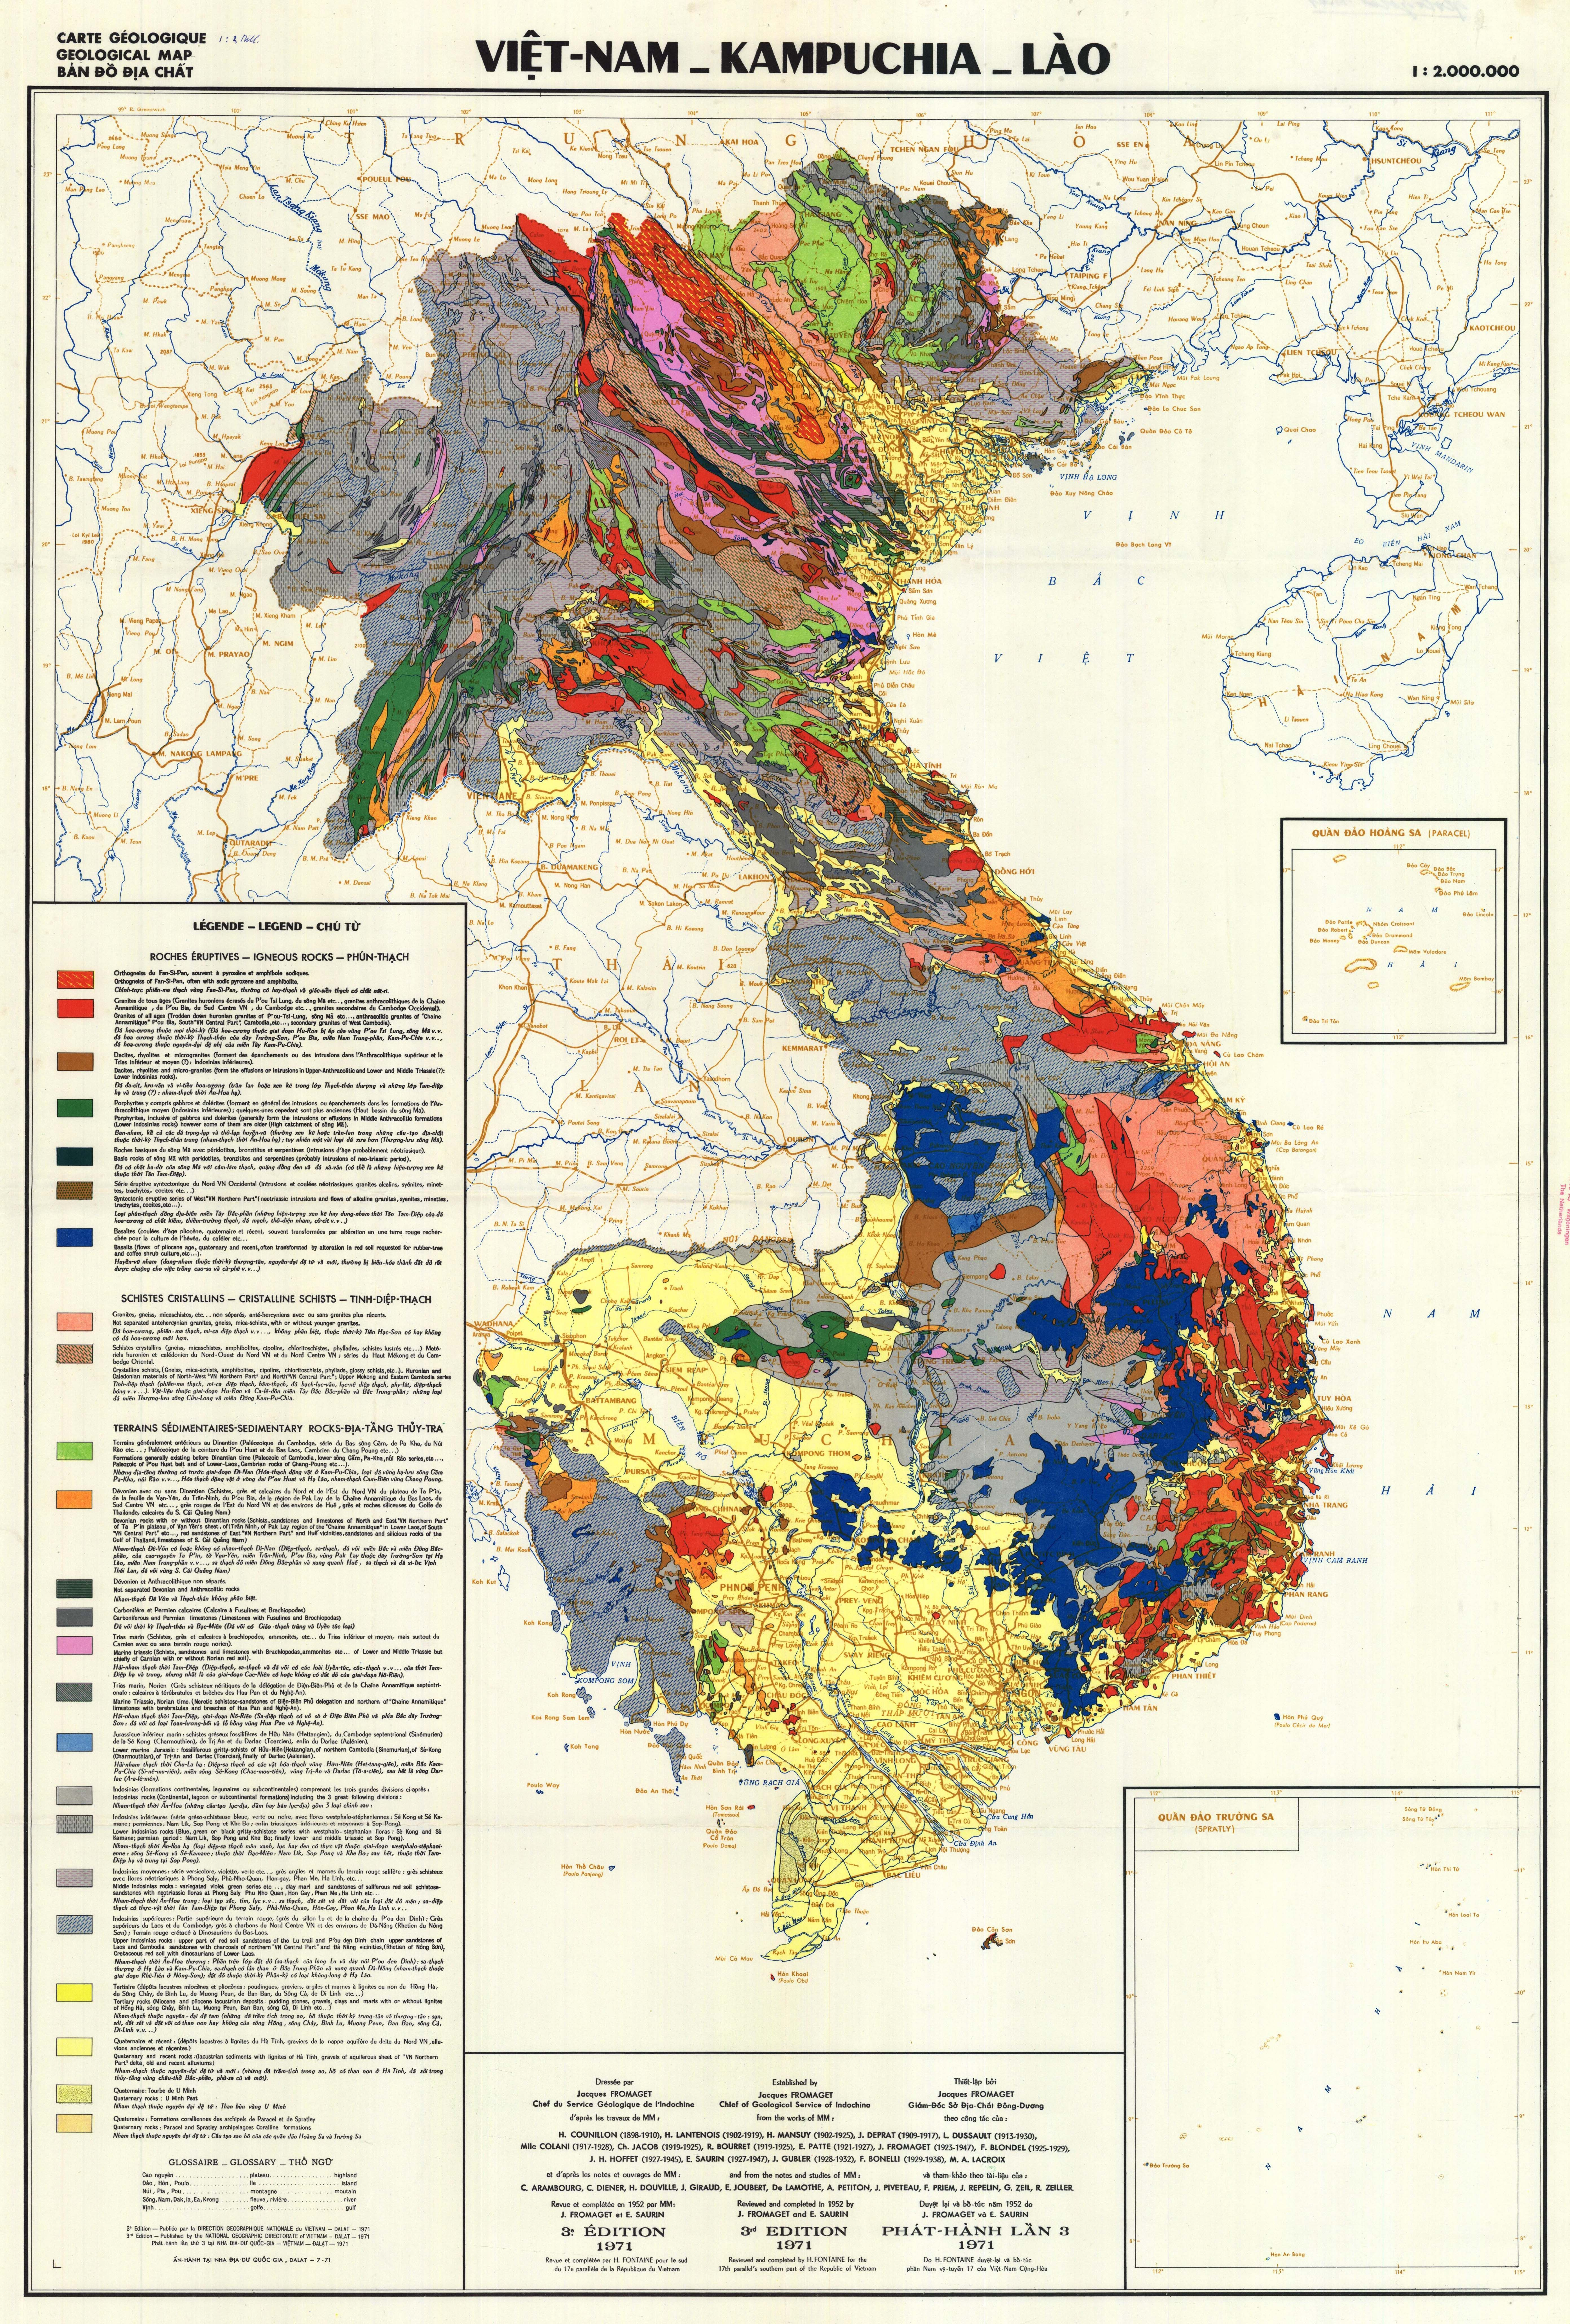 Vietnam, Cambodia, Lao Geology Map, 1971 #map #geology #vietnam - National Geographic Topo Maps California